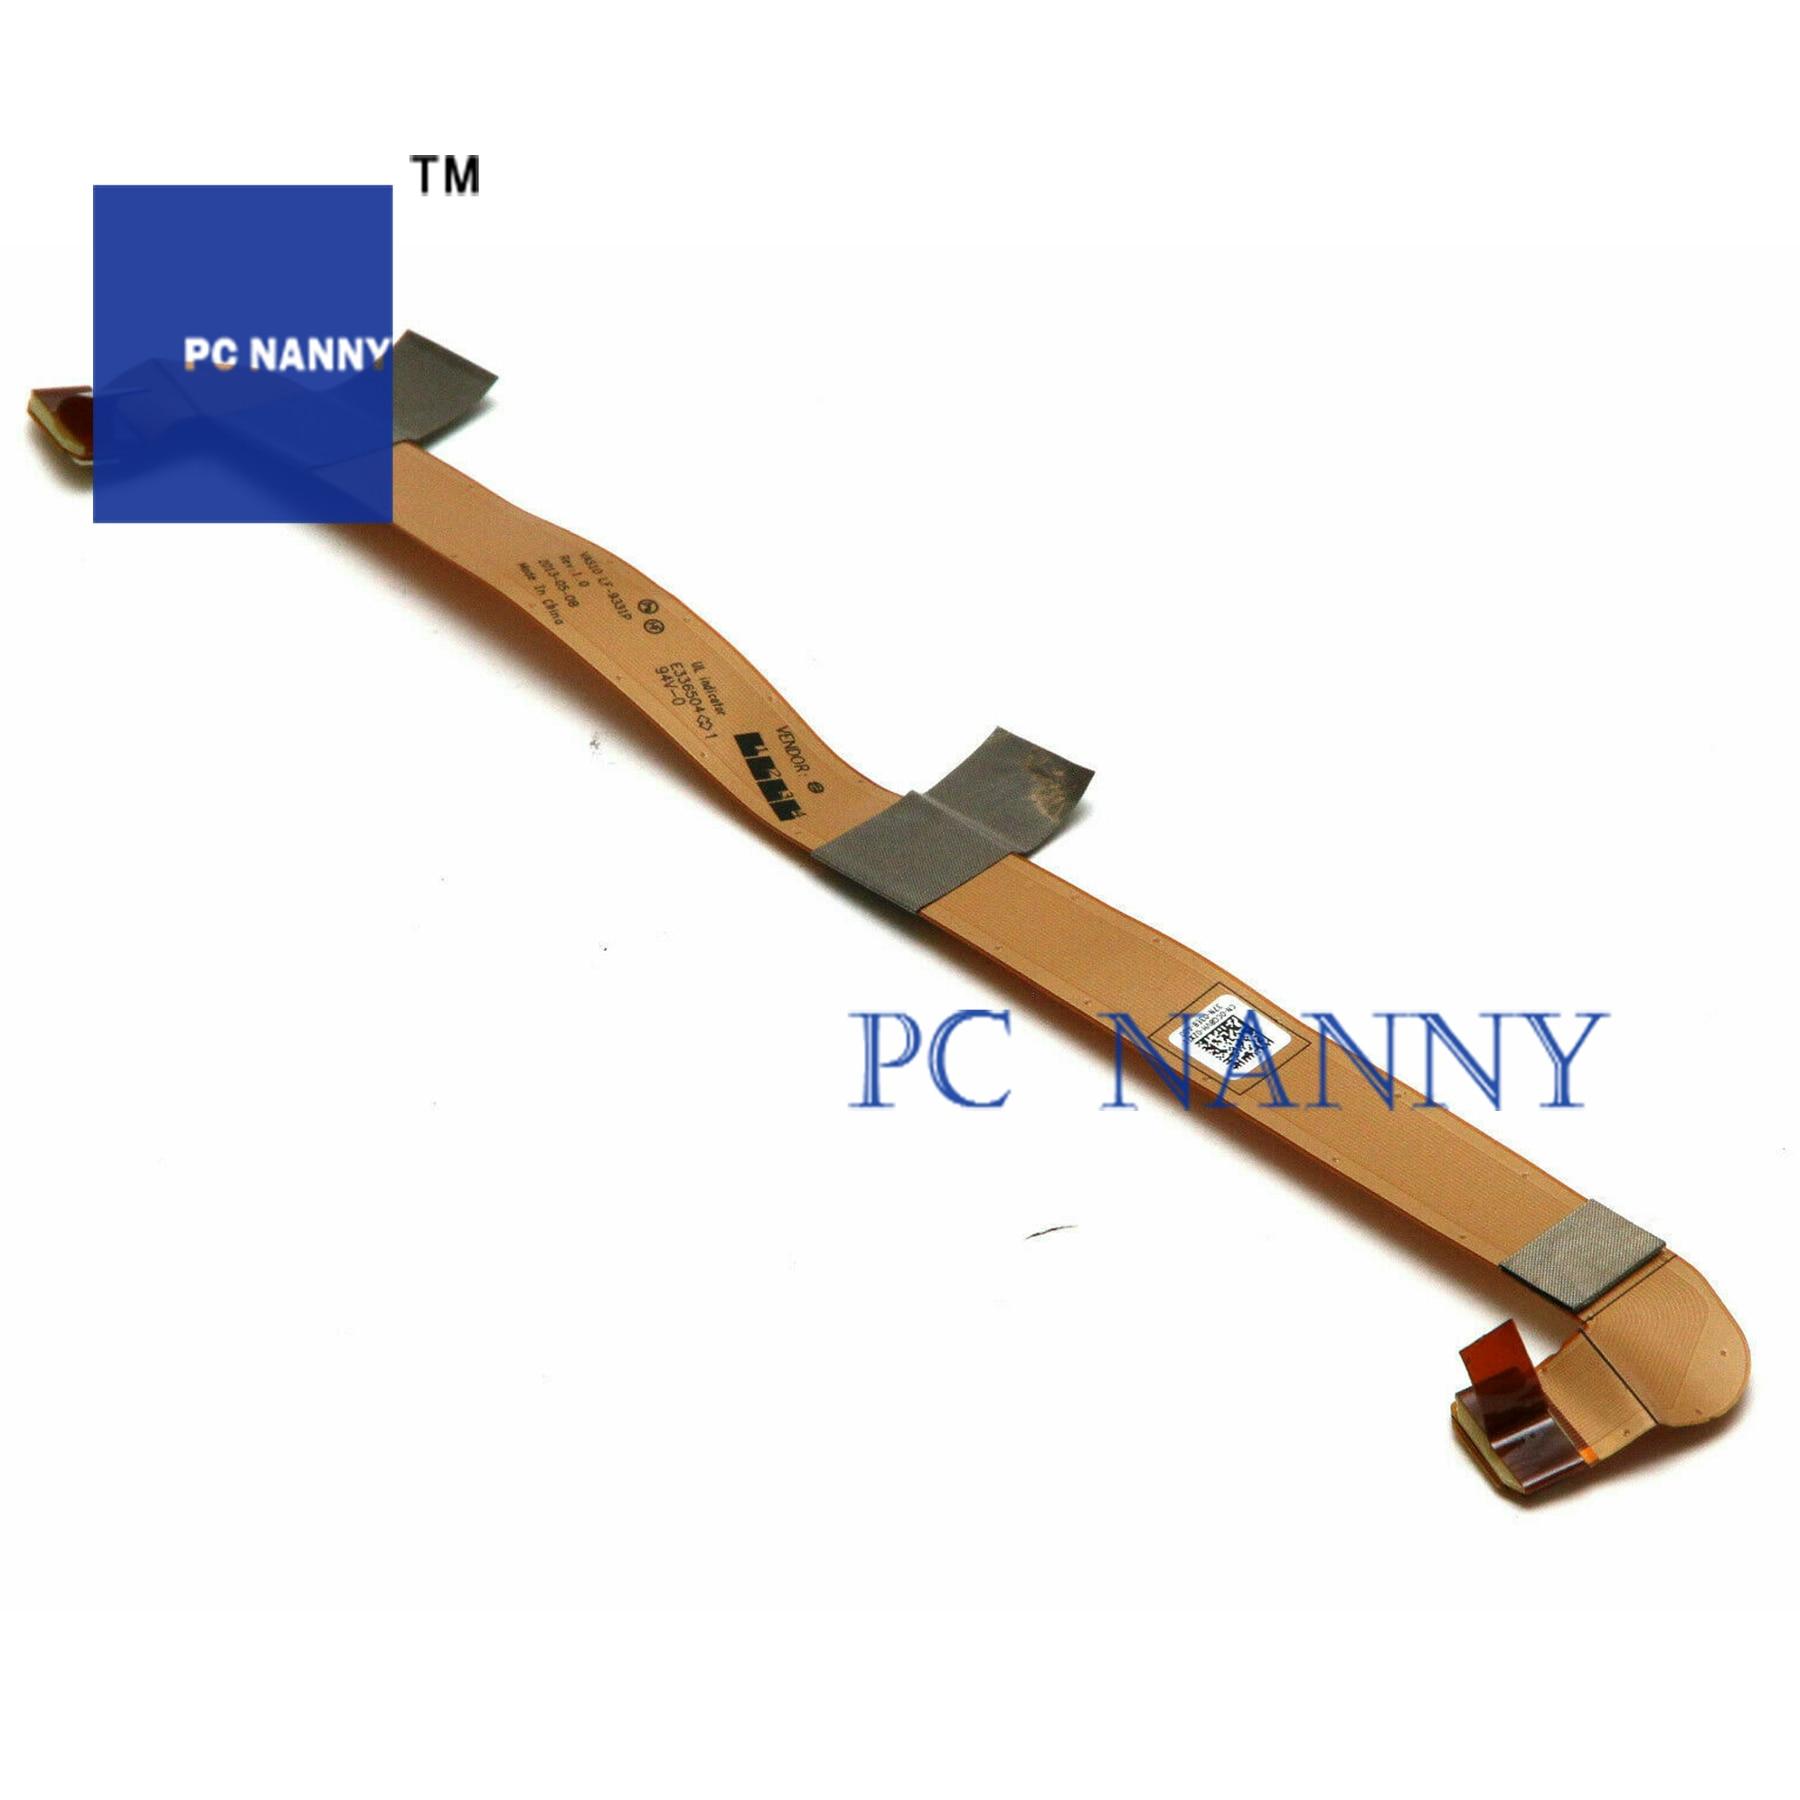 PCNANNY FOR  Dell Alienware 18 M18X R3 Laptop Nvidia SLI Cable Connector 0CG8VH CG8VH LF-9331P  Sensor Board  VAS10 LS-933GP